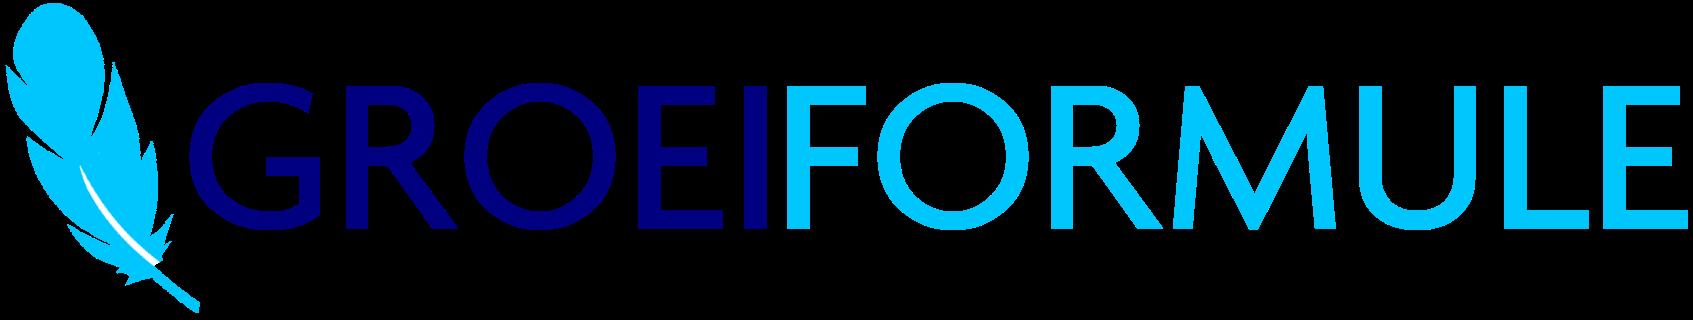 Volledig logo transparant